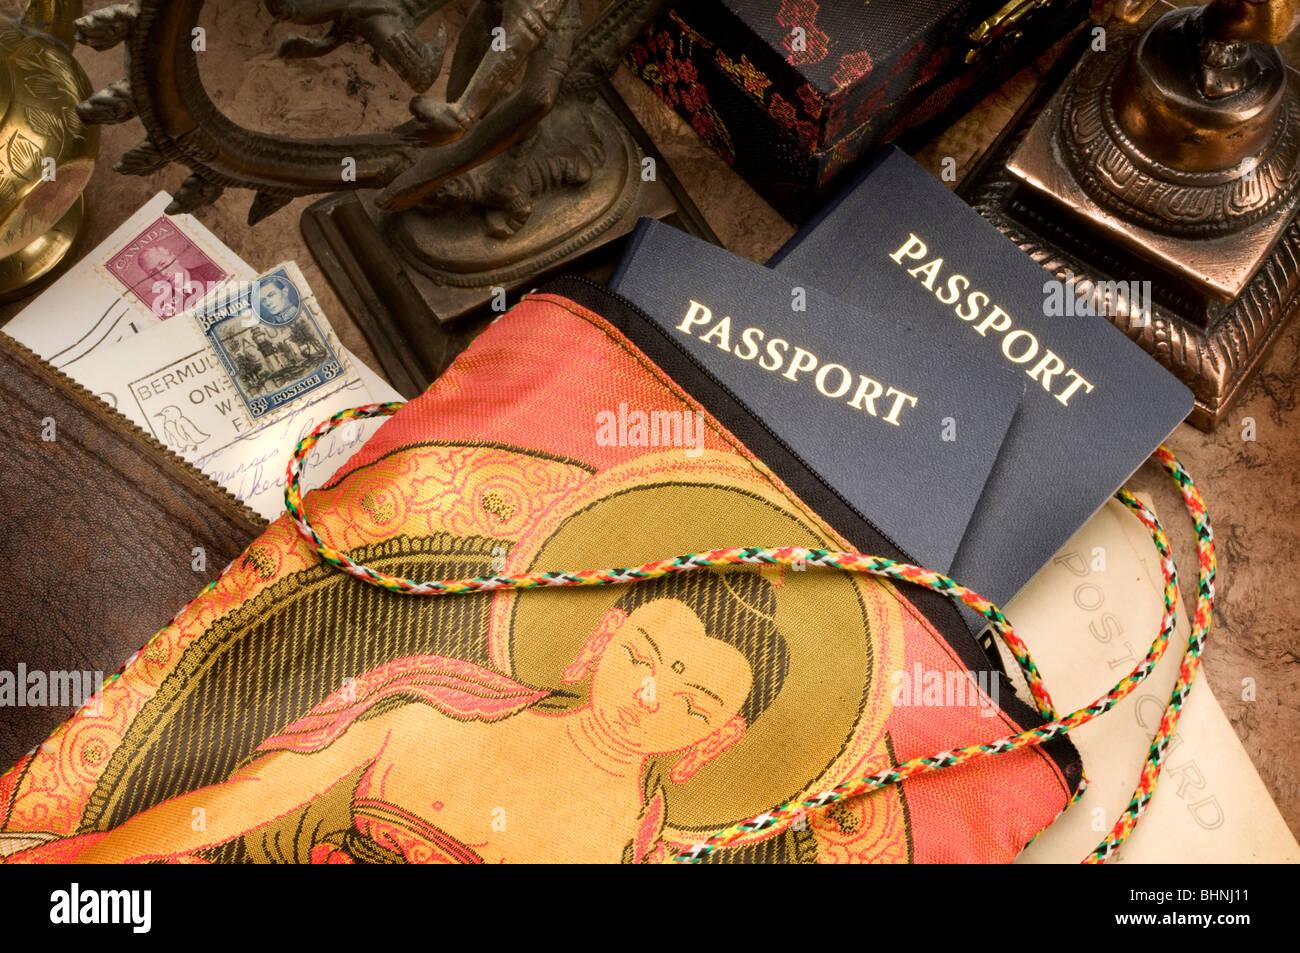 travel still life - Stock Image